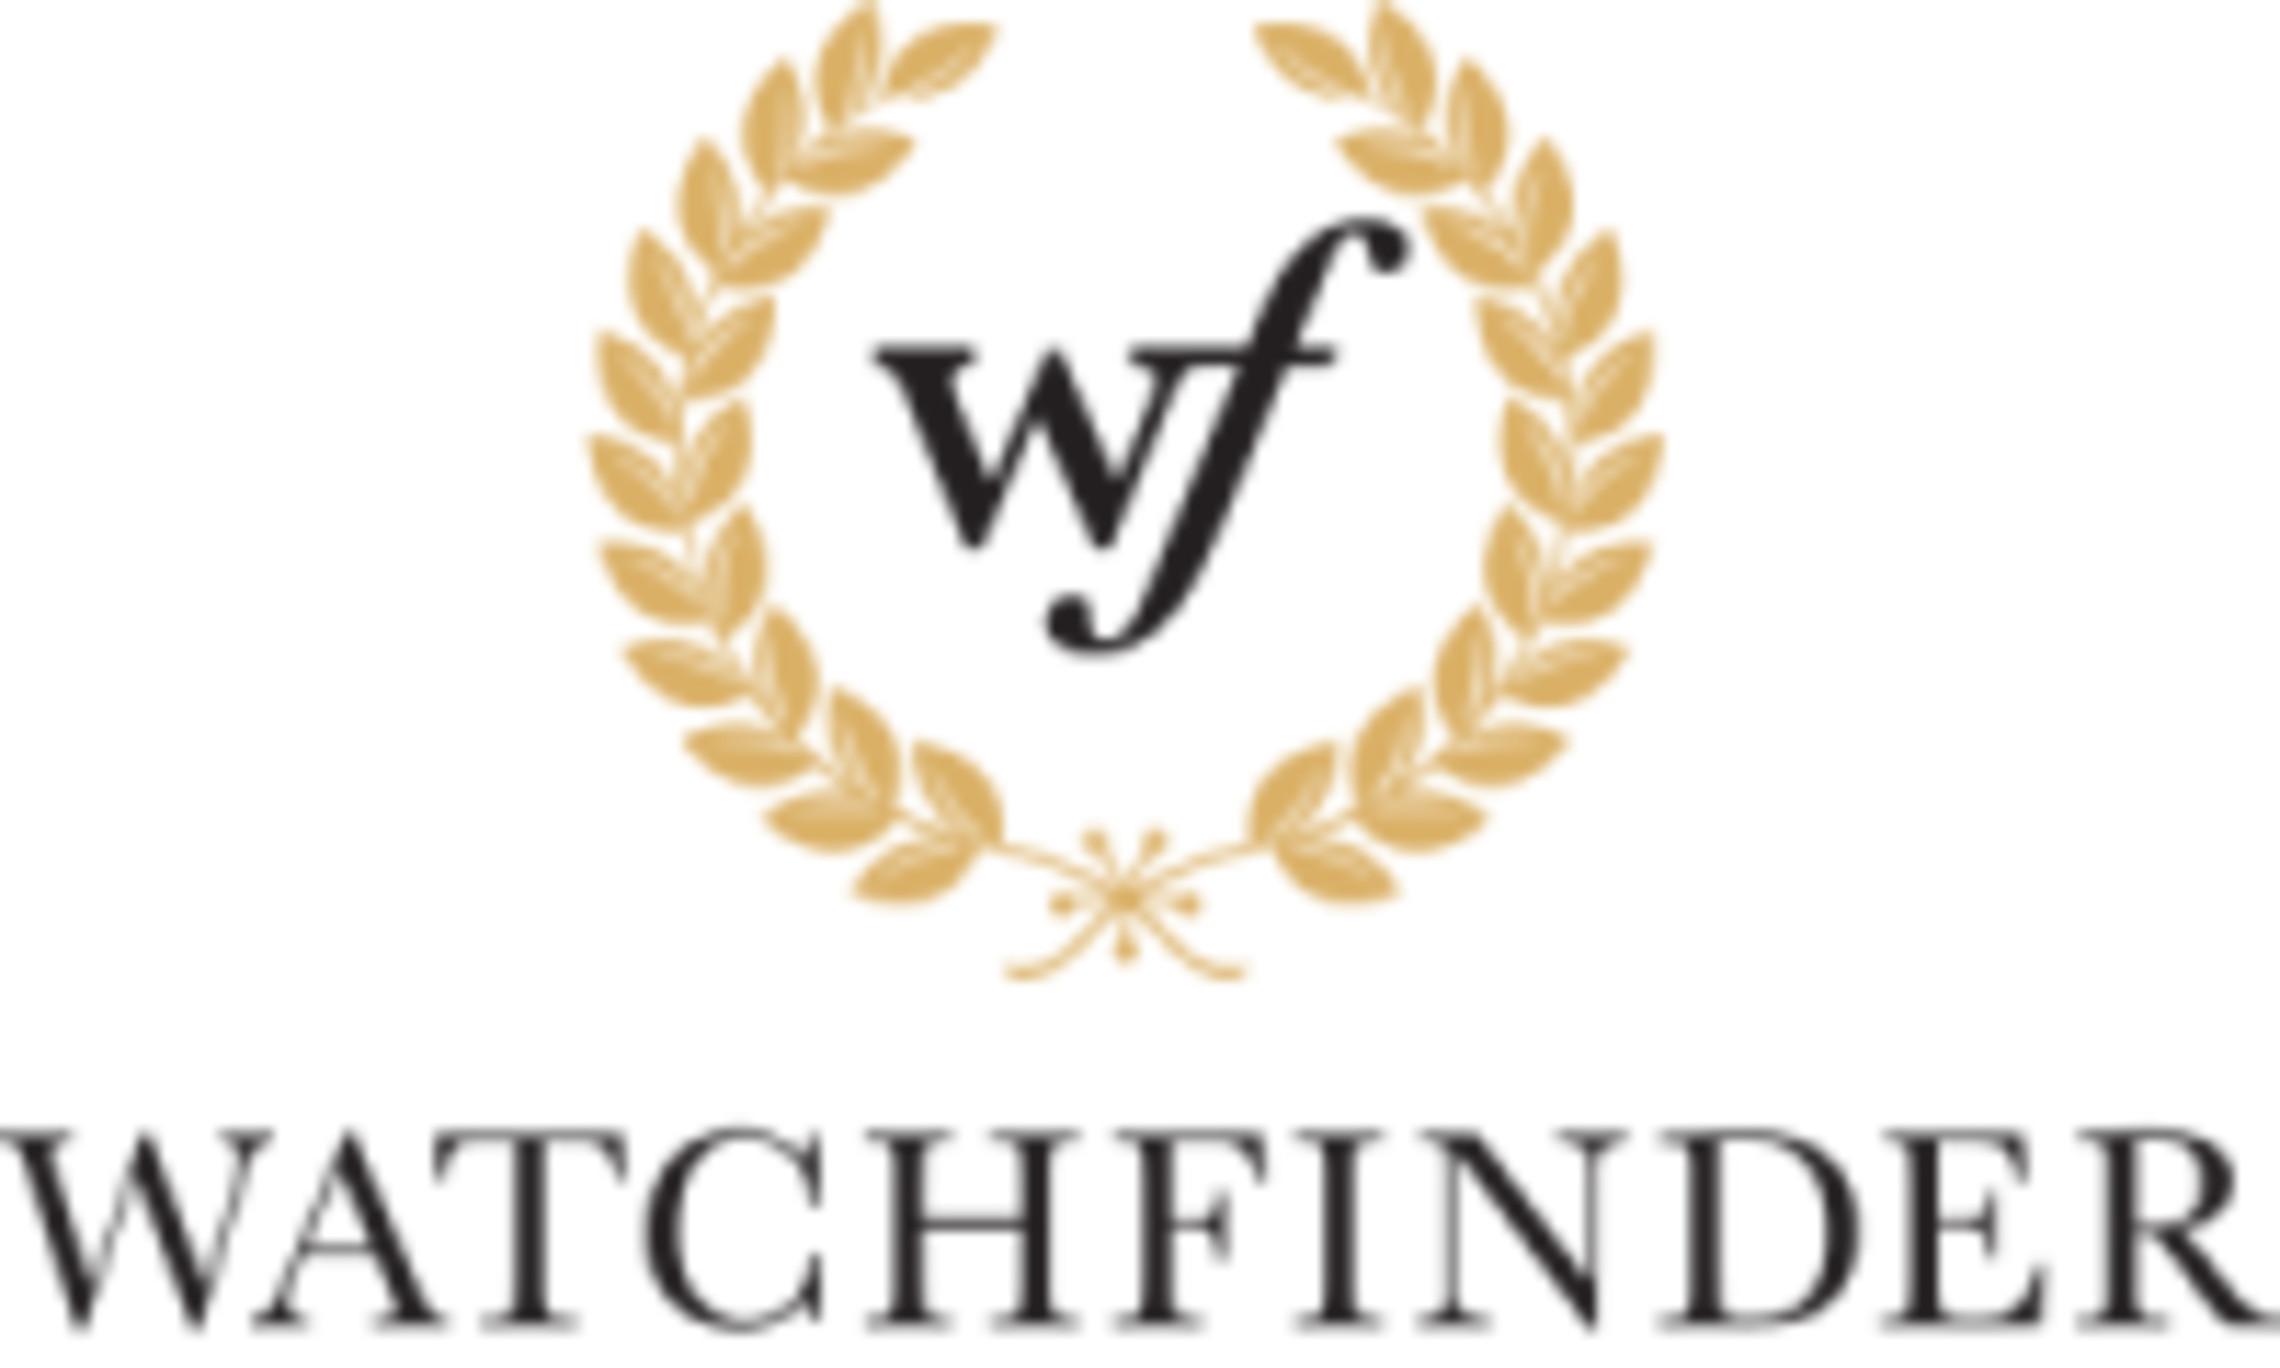 watchfinder- company logo